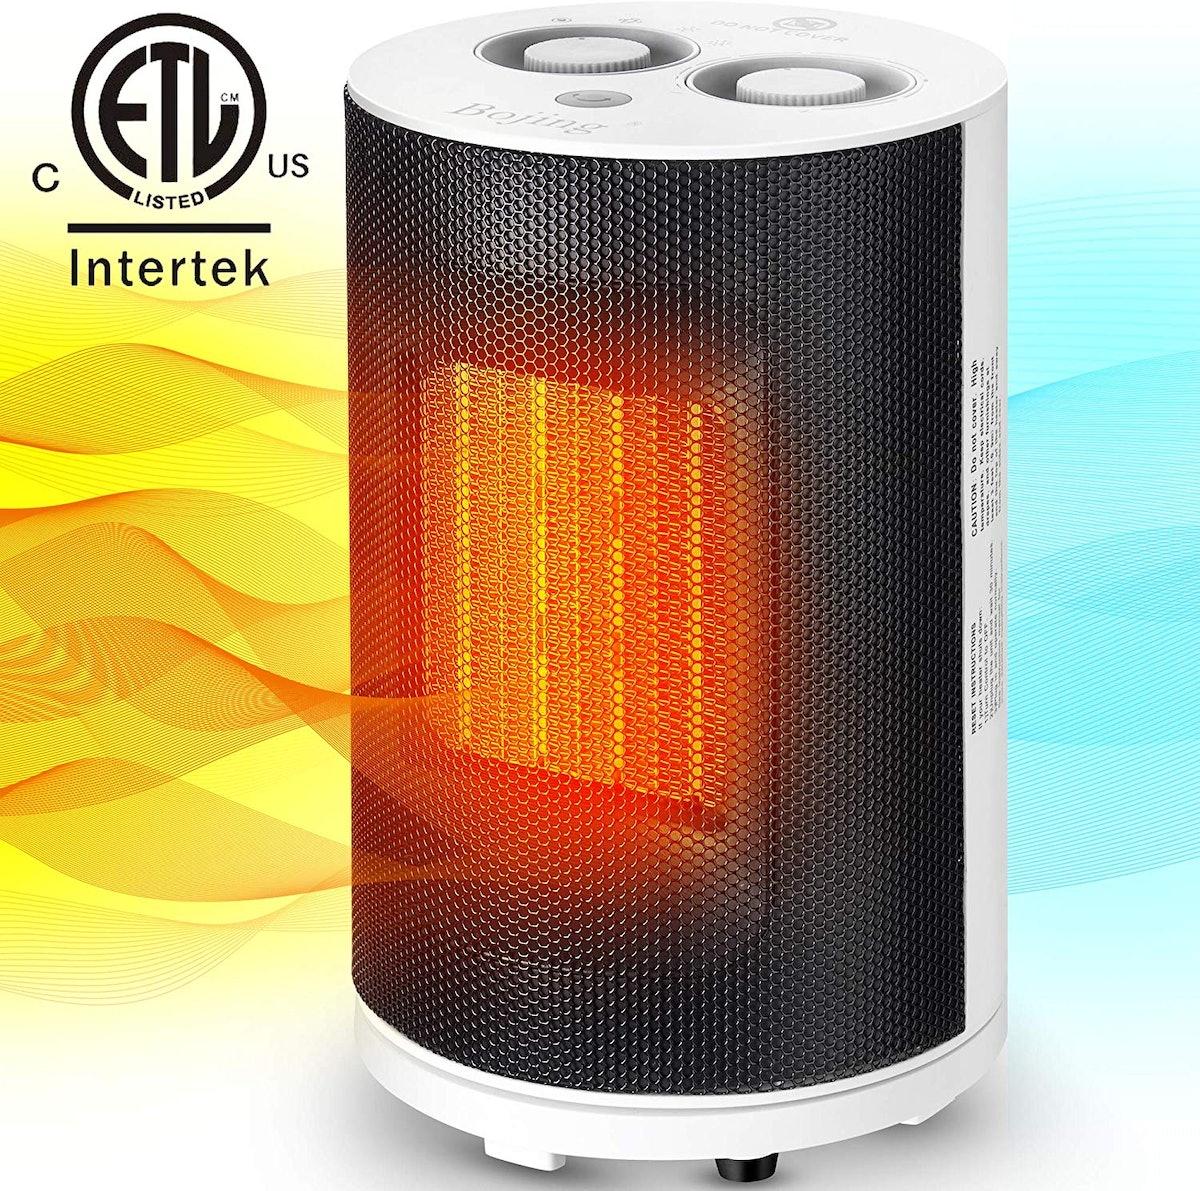 Bojing Portable Indoor Space Heater